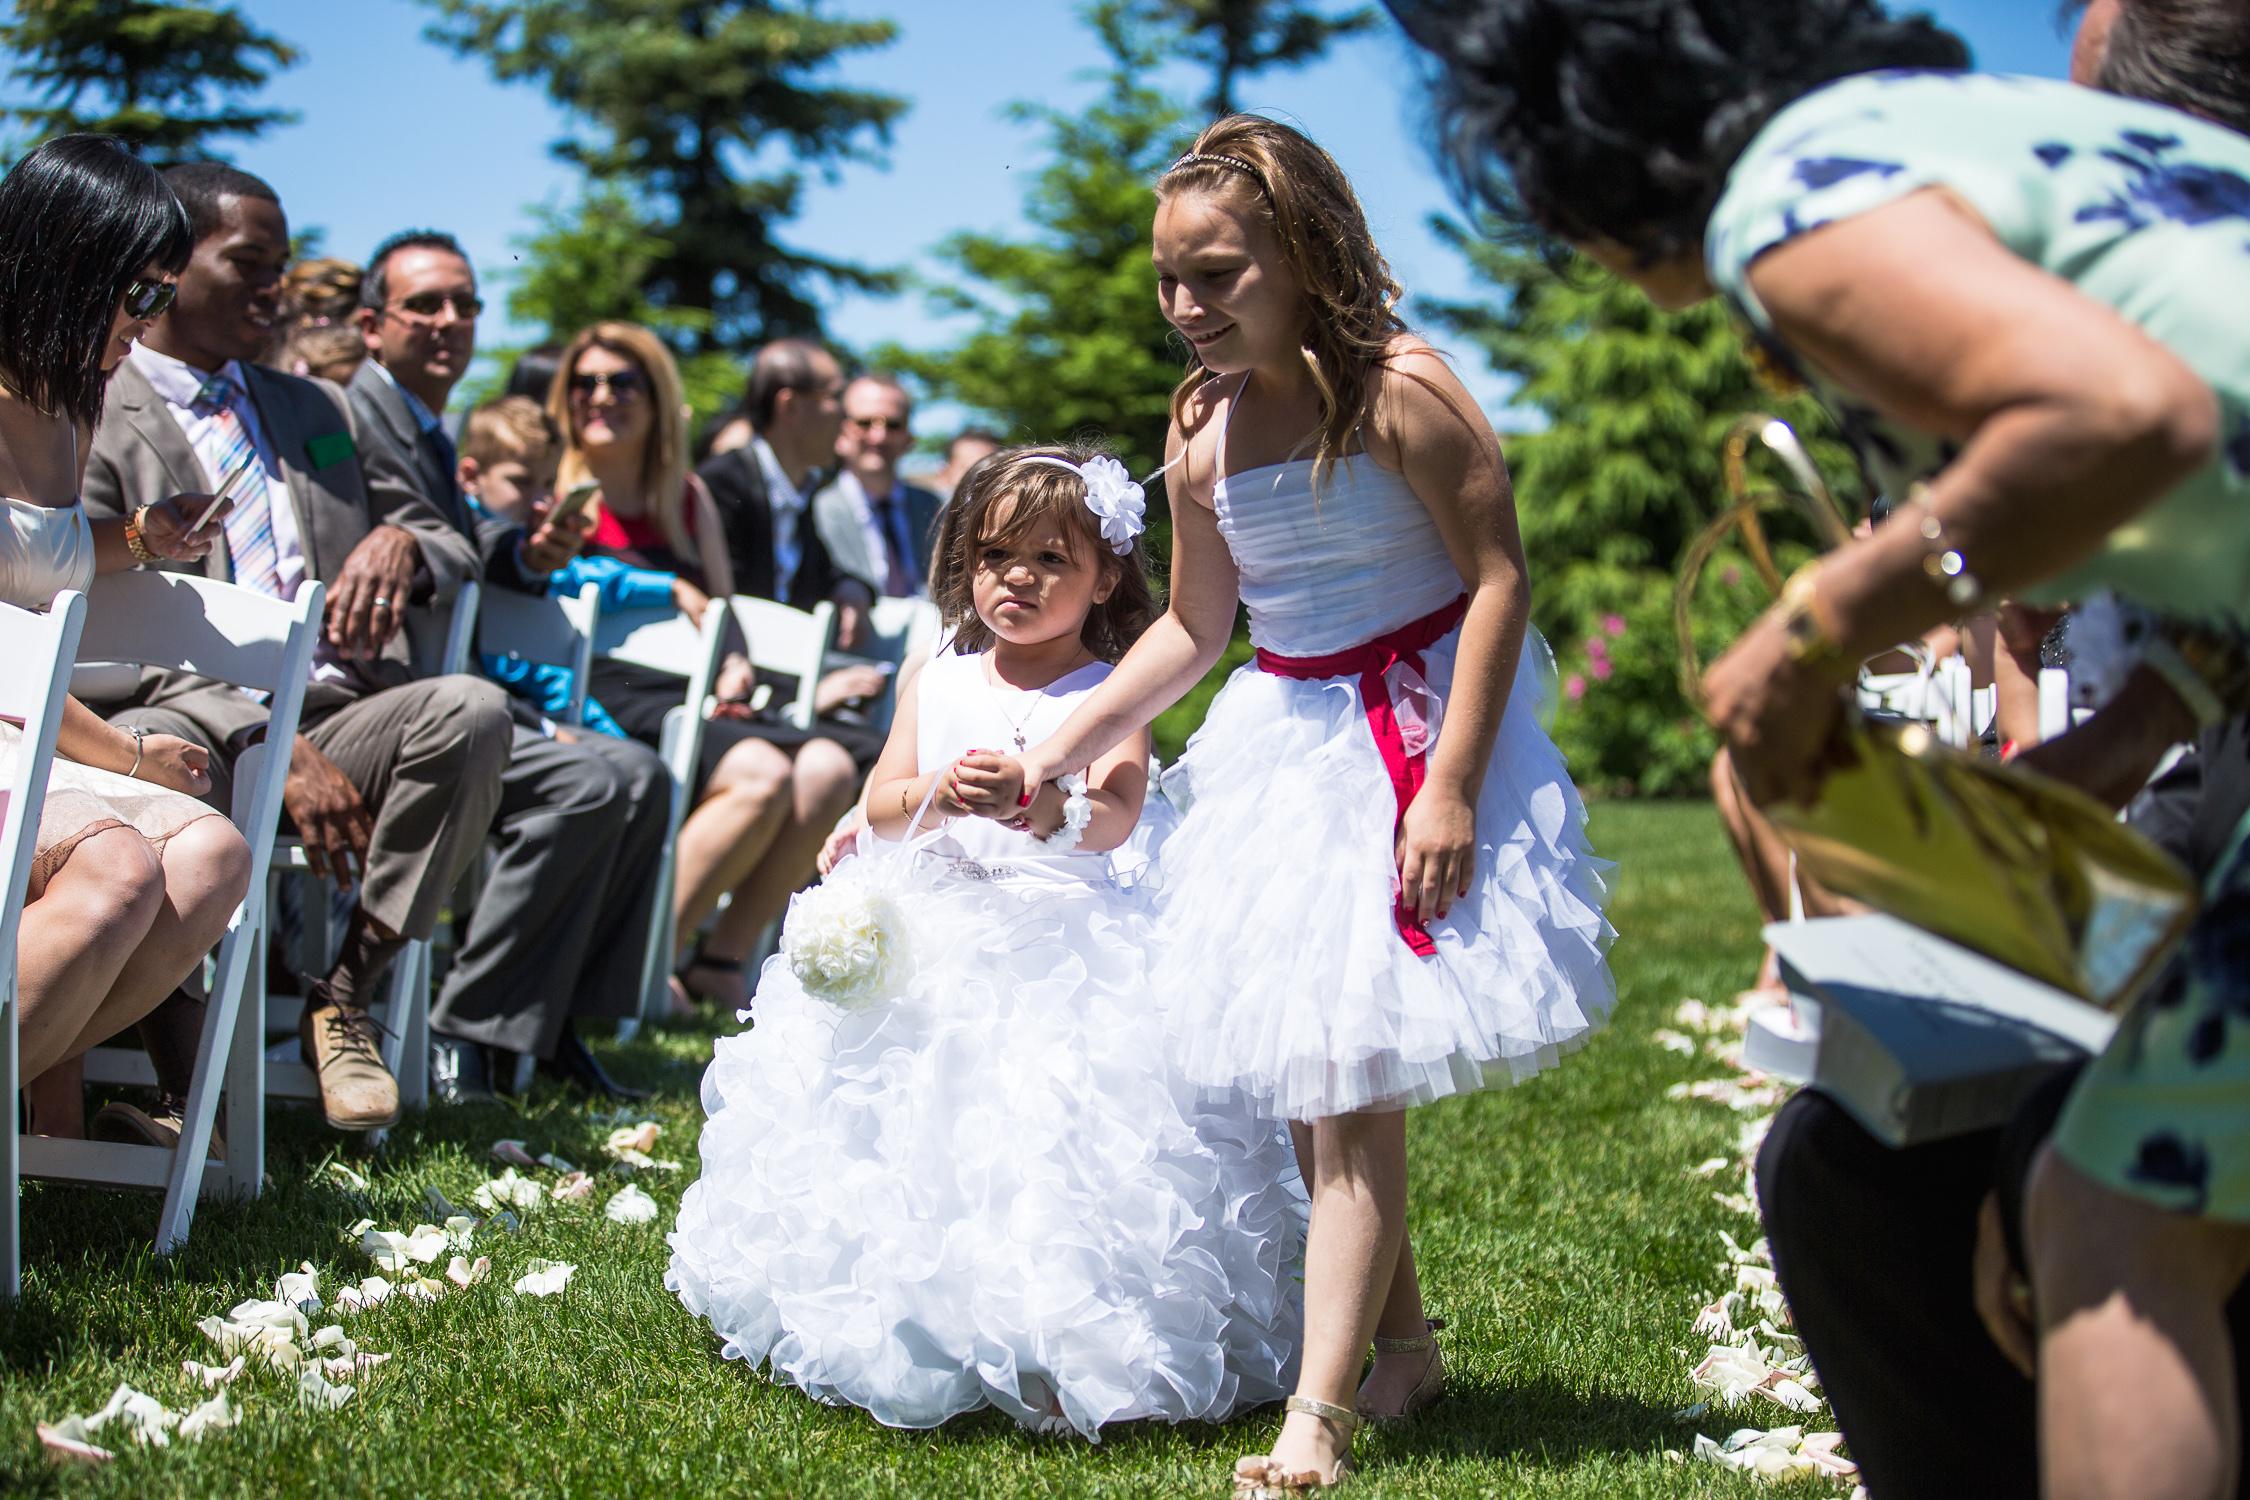 Paradise-Banquet-Hall-Wedding-Vaughan-Ontario-0032.jpg